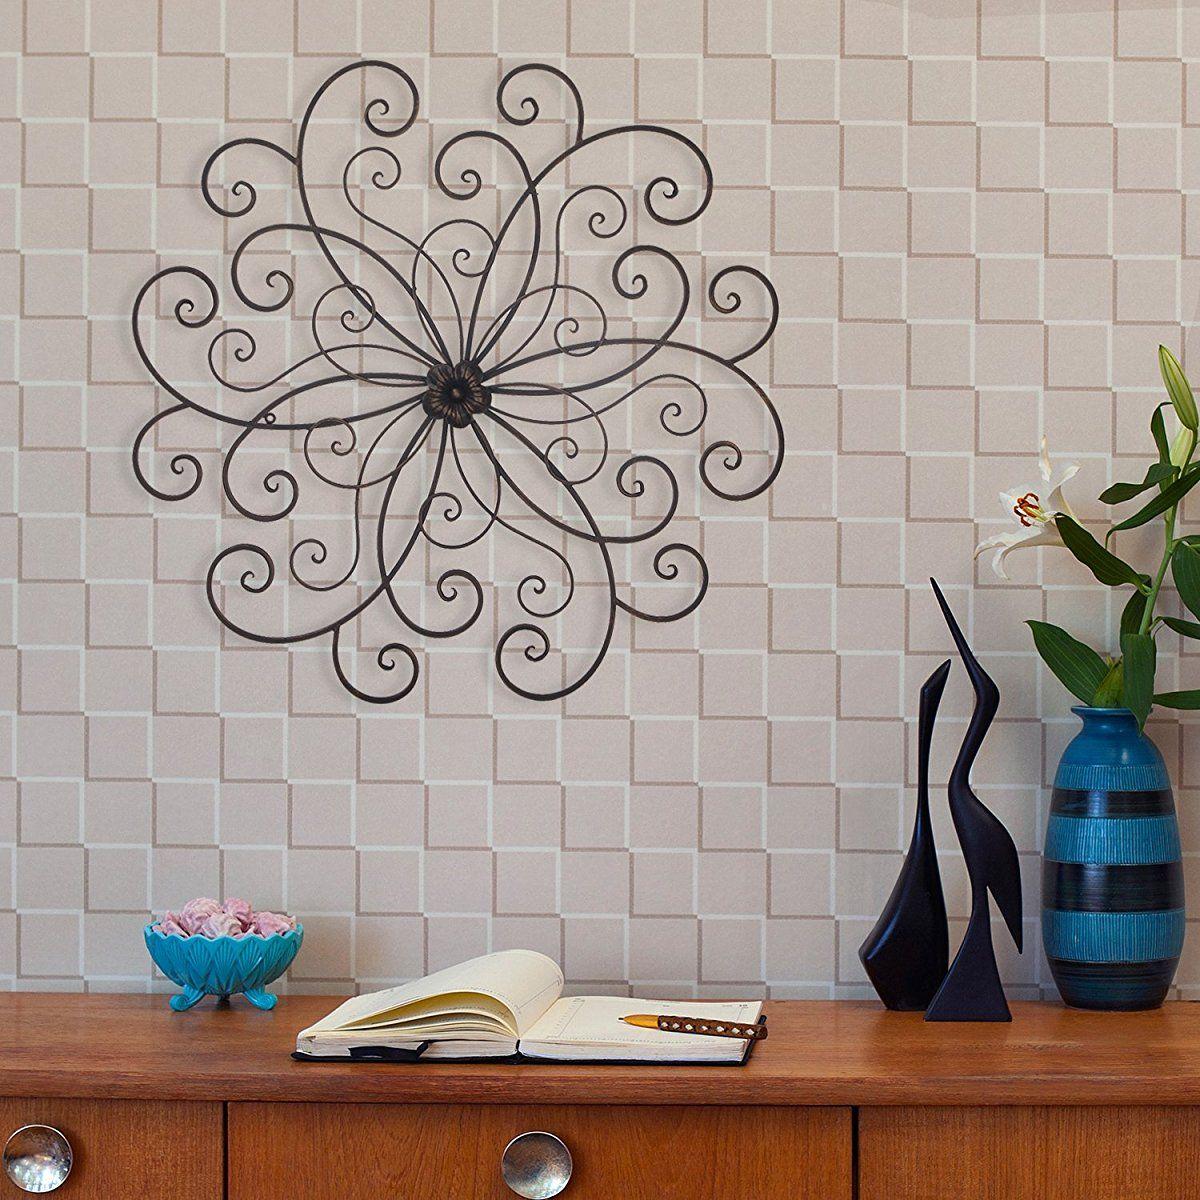 Homes Art Bronze Flower Urban Design Metal Wall Decor For In Flower Urban Design Metal Wall Decor (View 13 of 30)